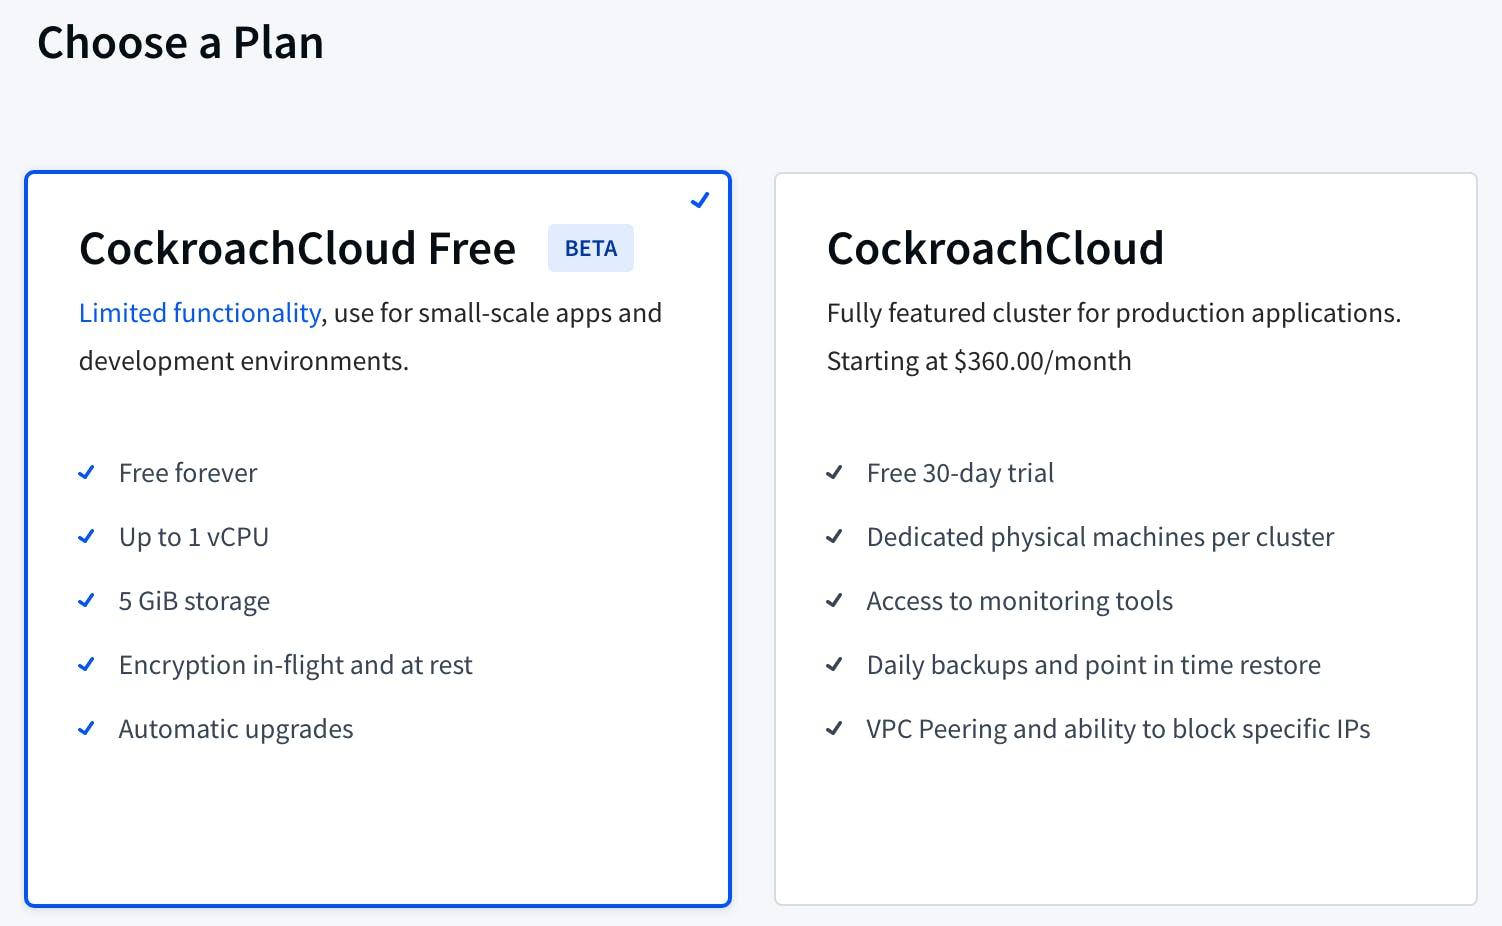 choose a cockroachcloud plan